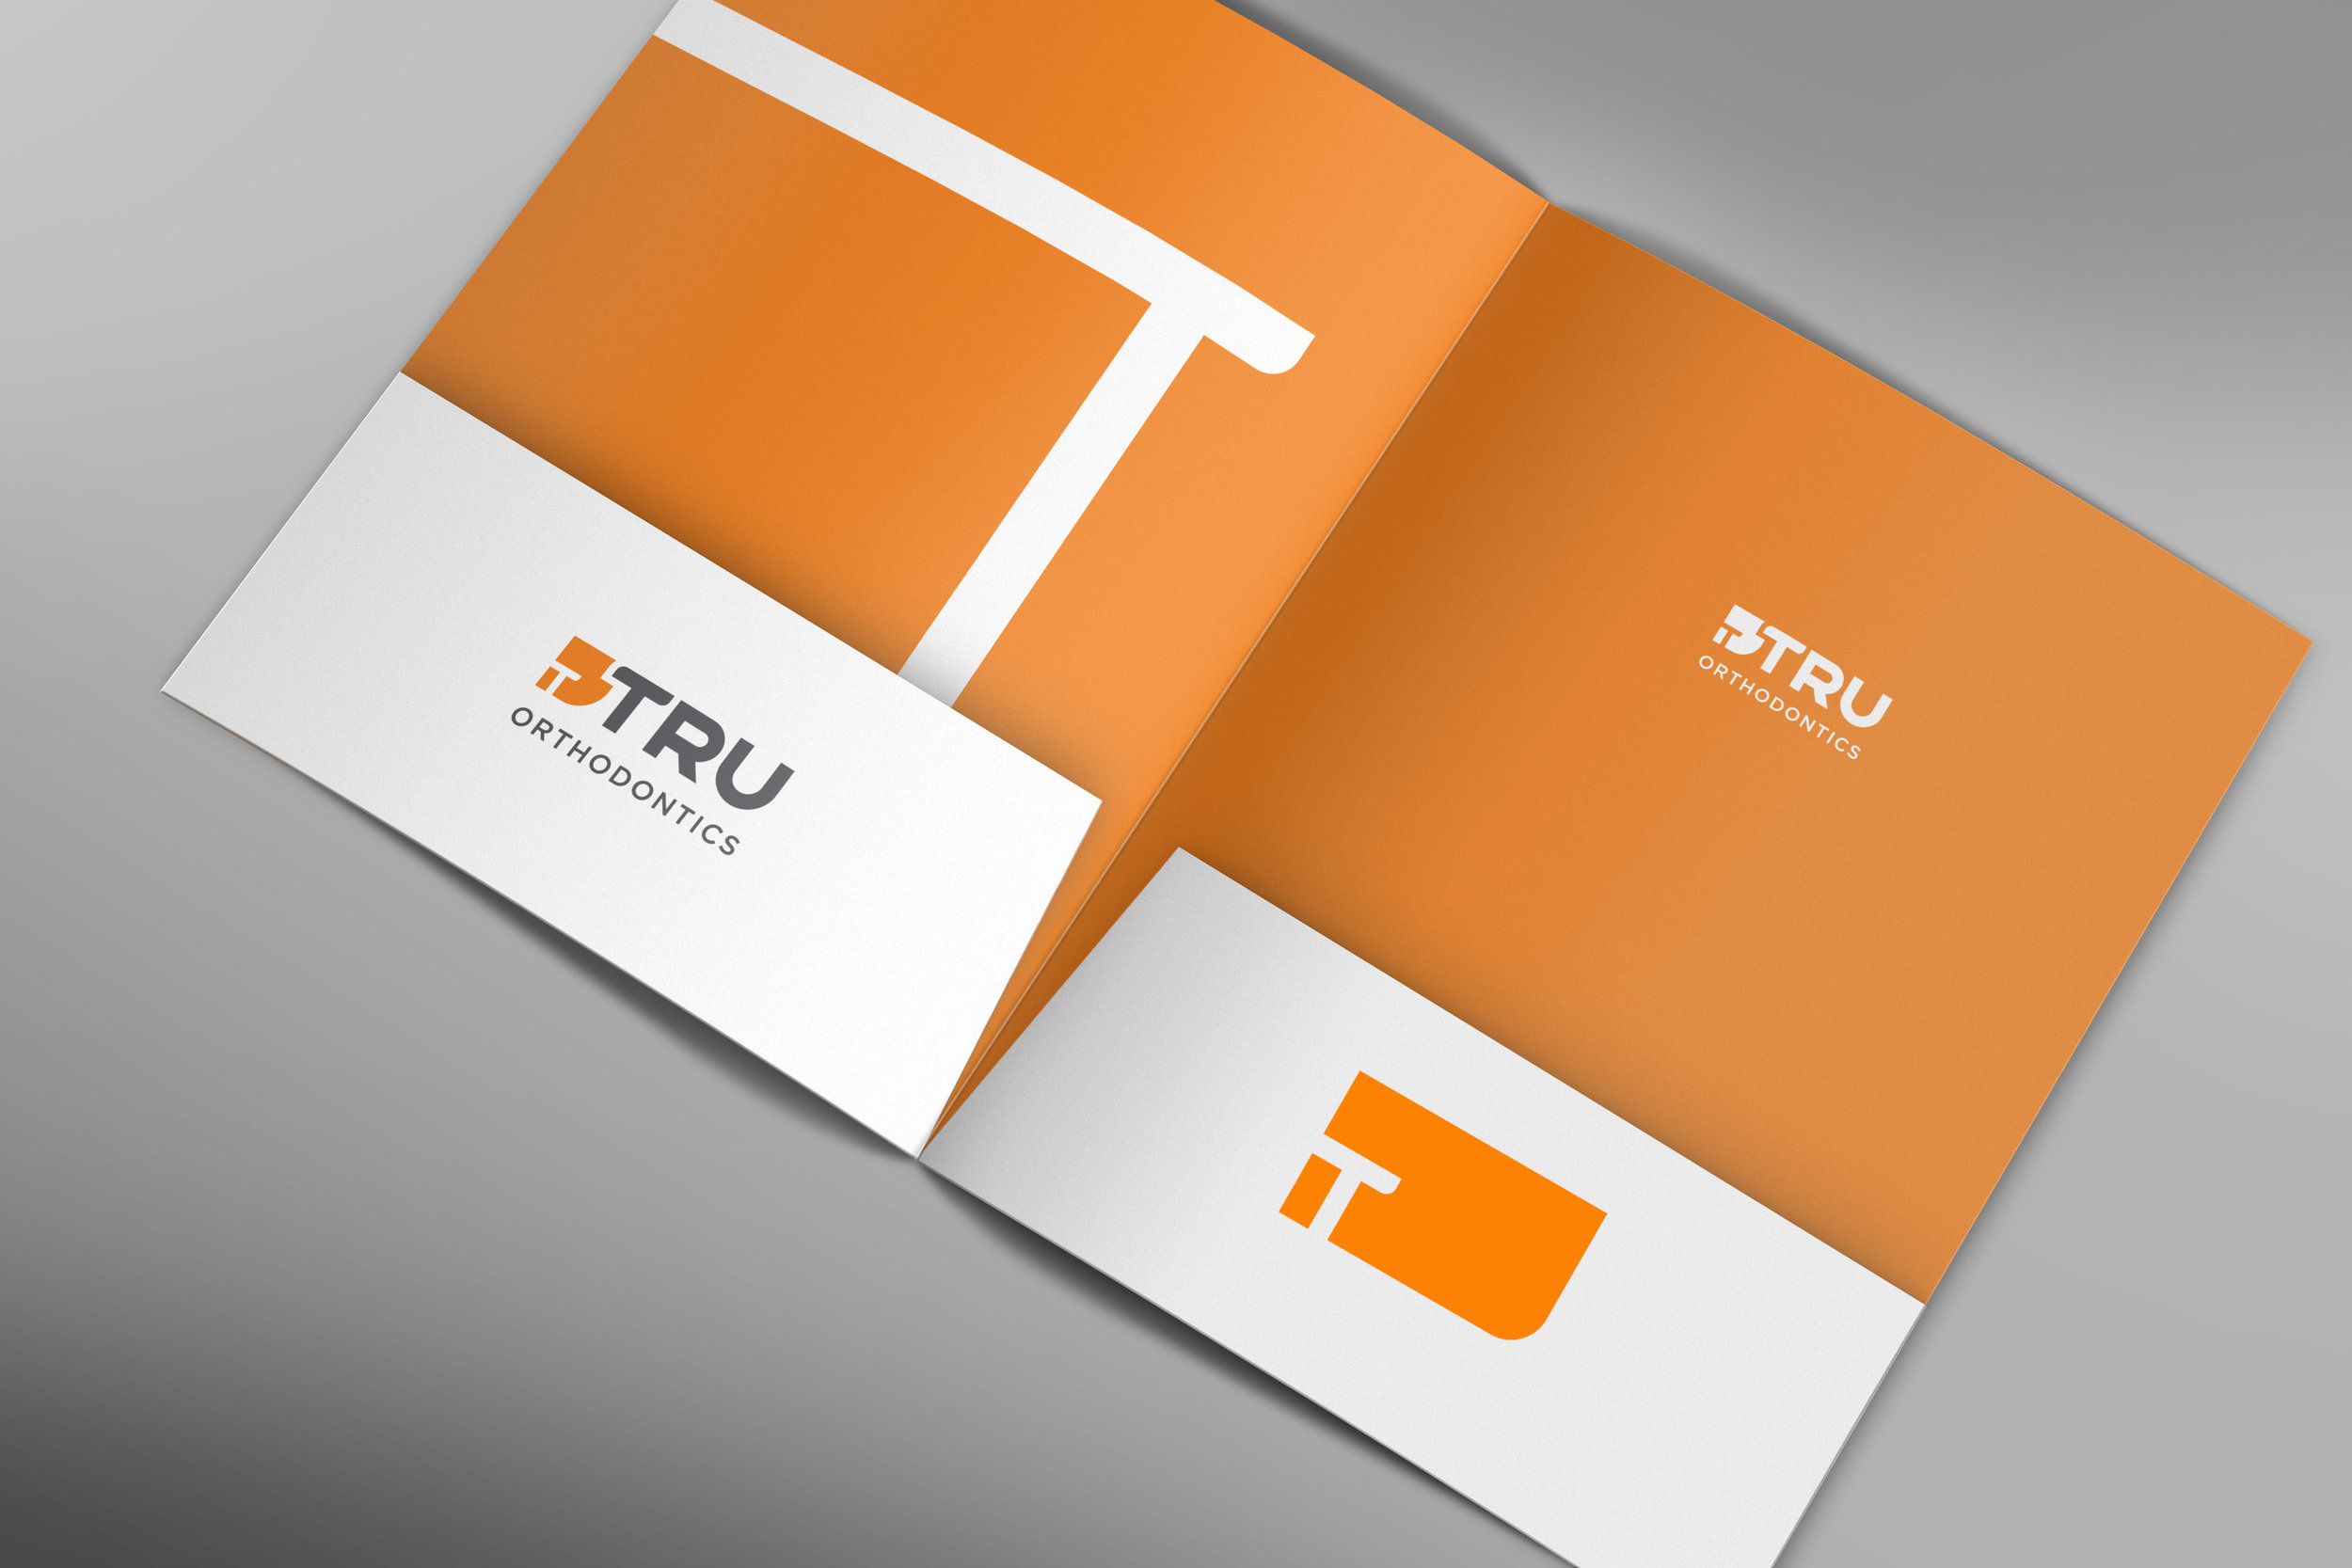 Tru Orthodontics presentation folder design